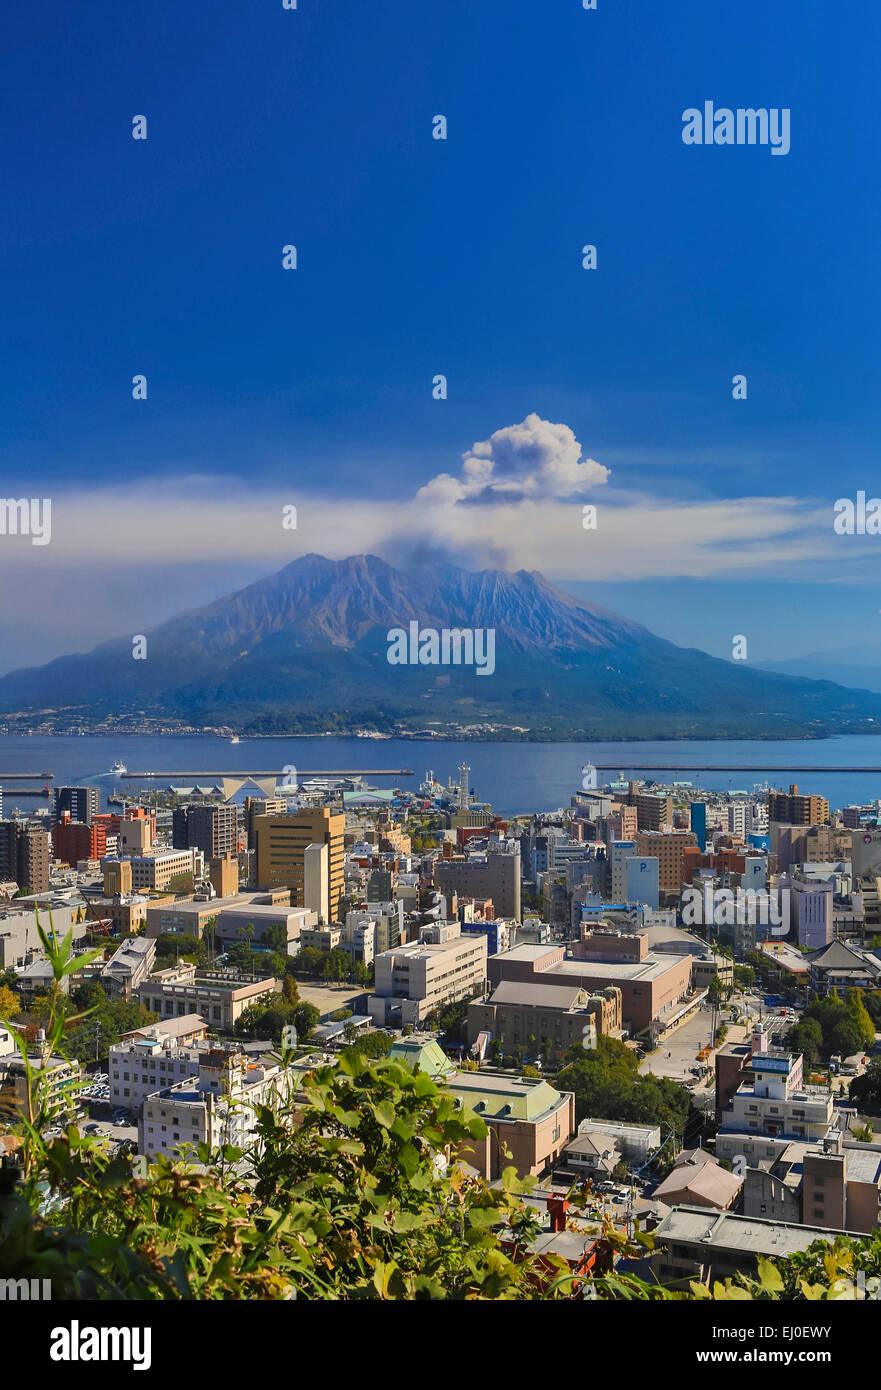 City, Japan, Asia, Kagoshima, Kyushu, Landscape, Sakurajima, Volcano, active, colourful, mountain, fall, island, - Stock Image